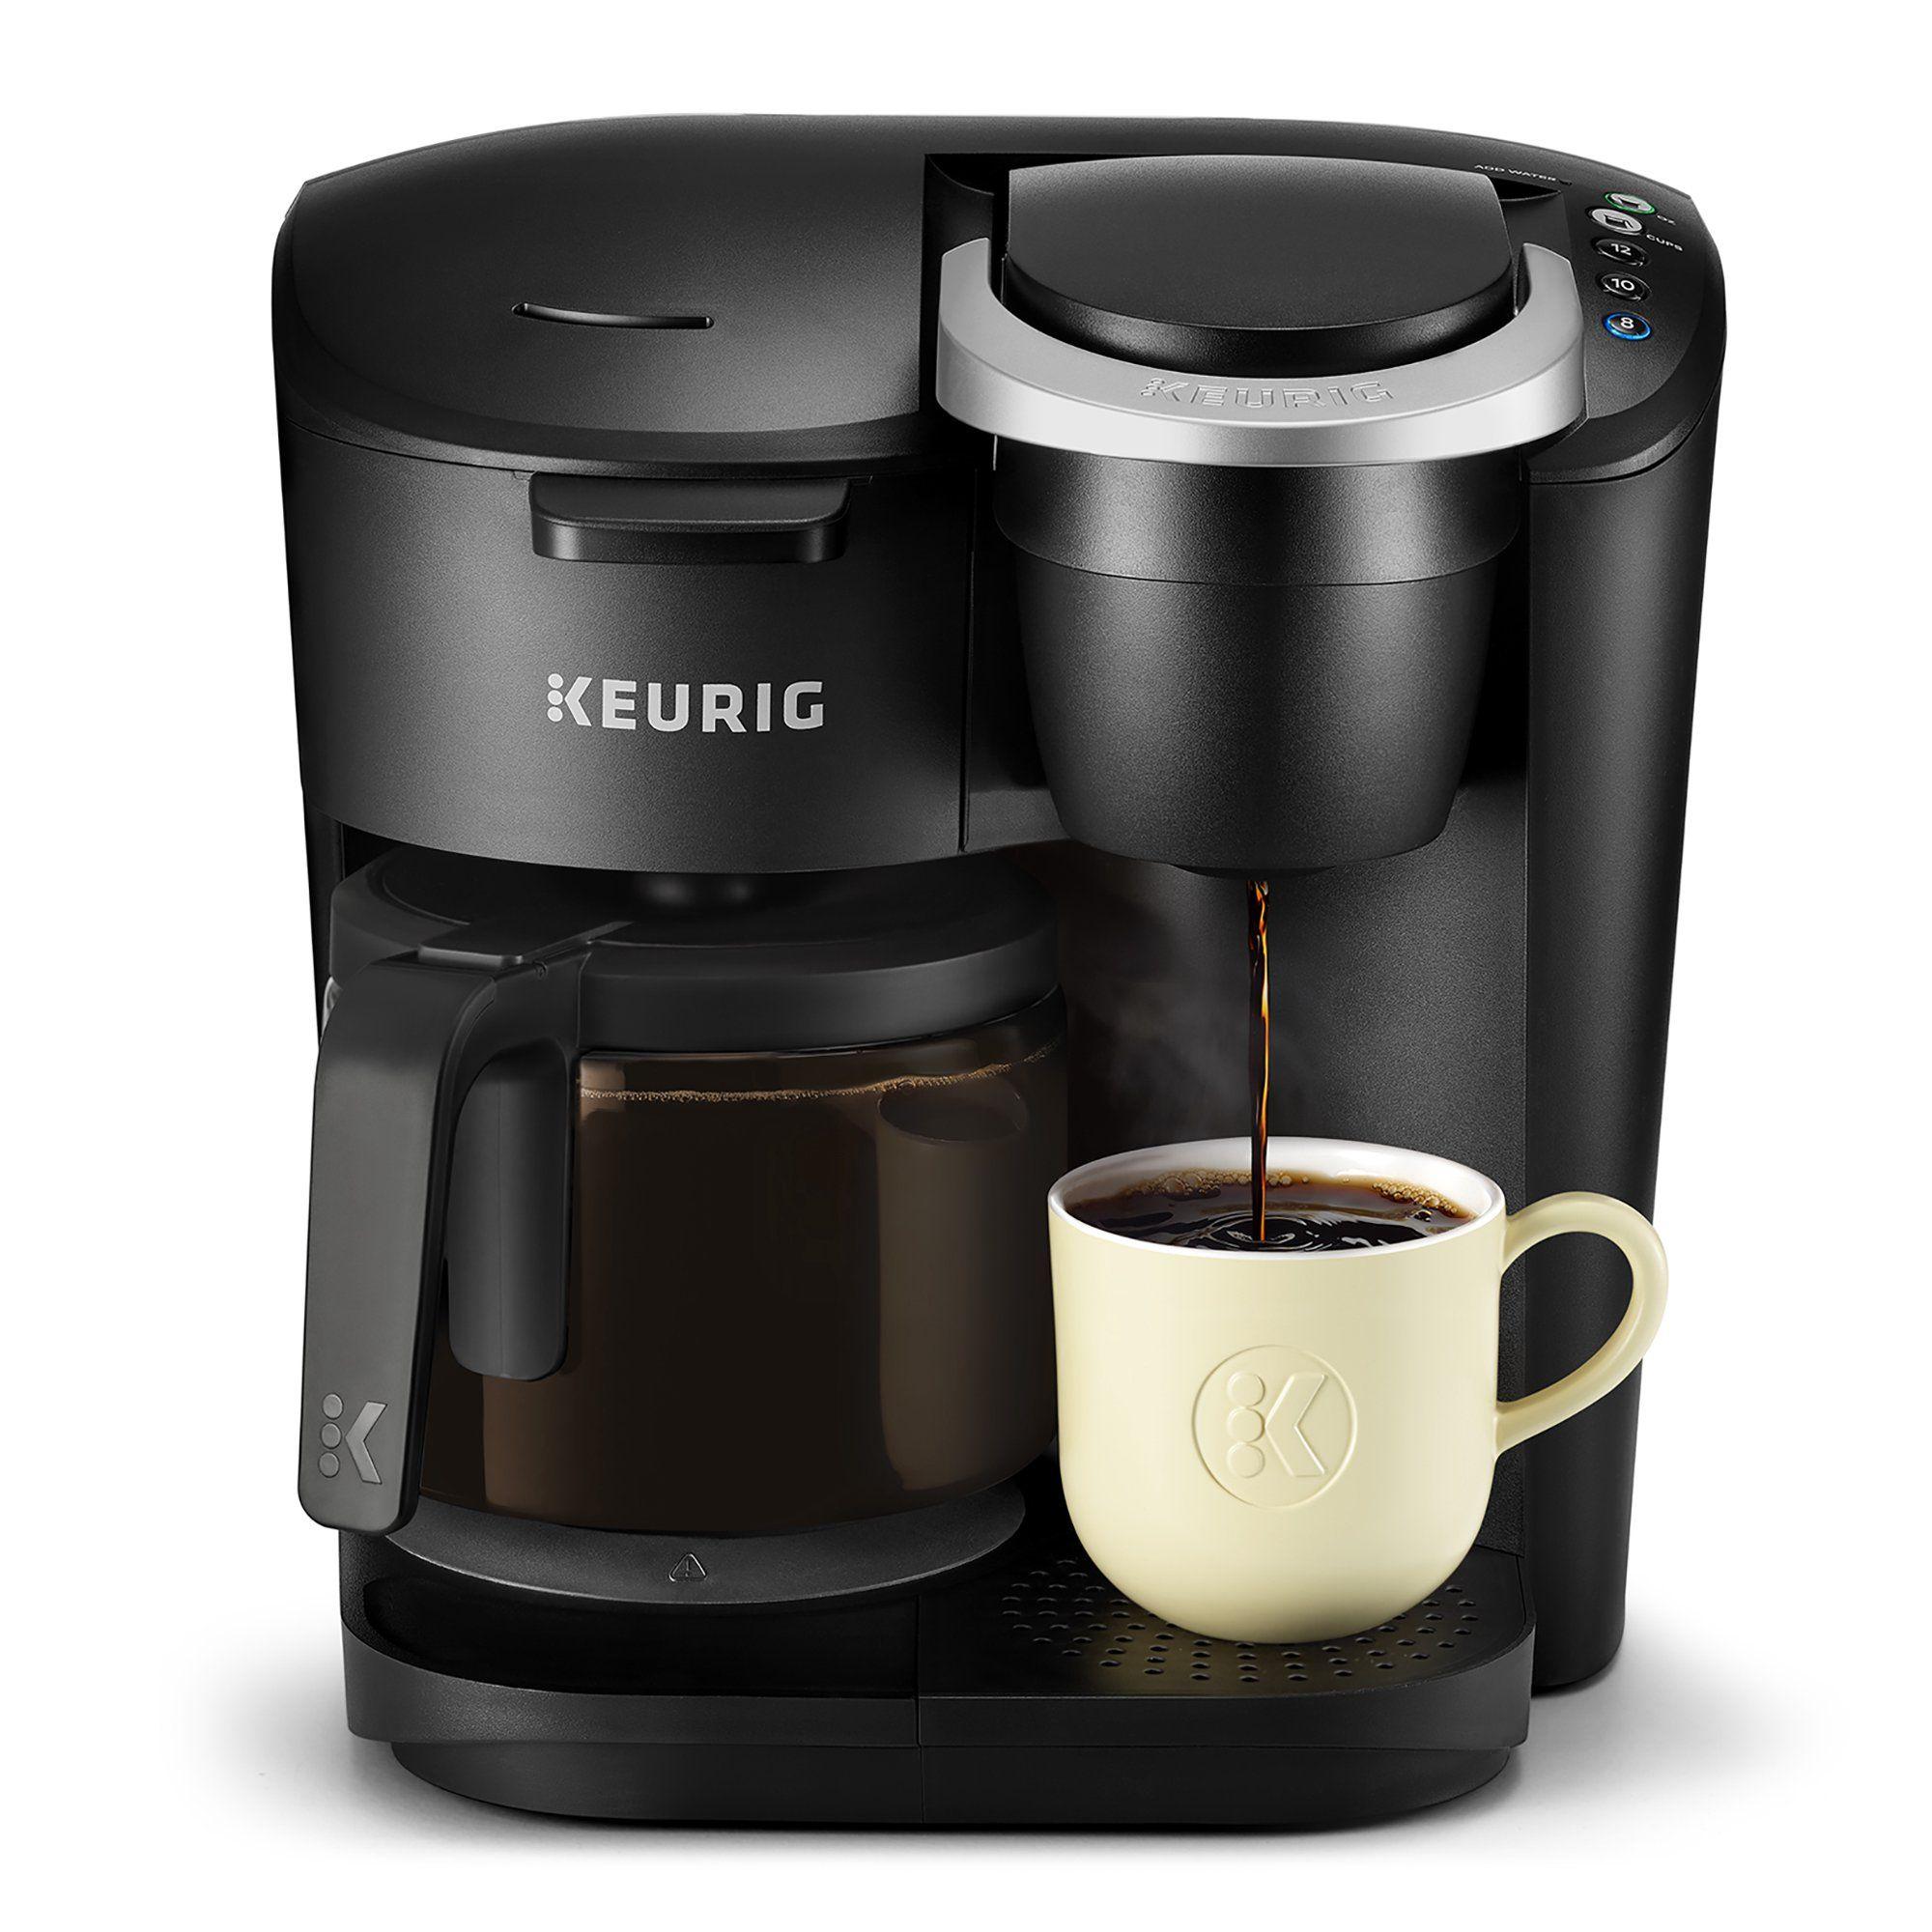 Keurig Duo Essentials Reviews